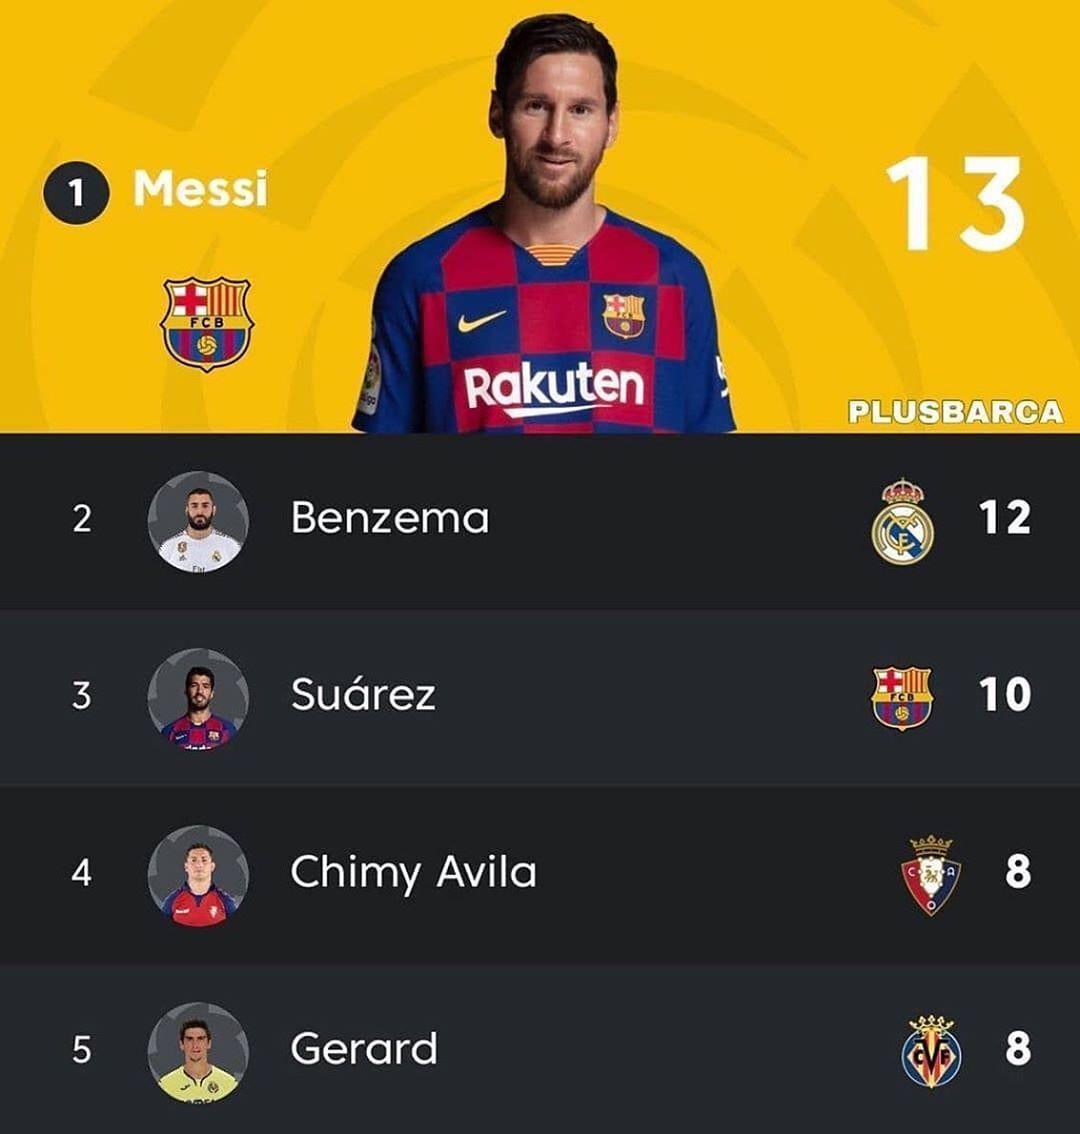 Ansu Fati Ansufati Championsleague Uefachampionsleague Legendsoftomorrow Campnou Sansiro Fcbarcelona Barca Barca Bar Leo Messi Luis Suarez Camp Nou